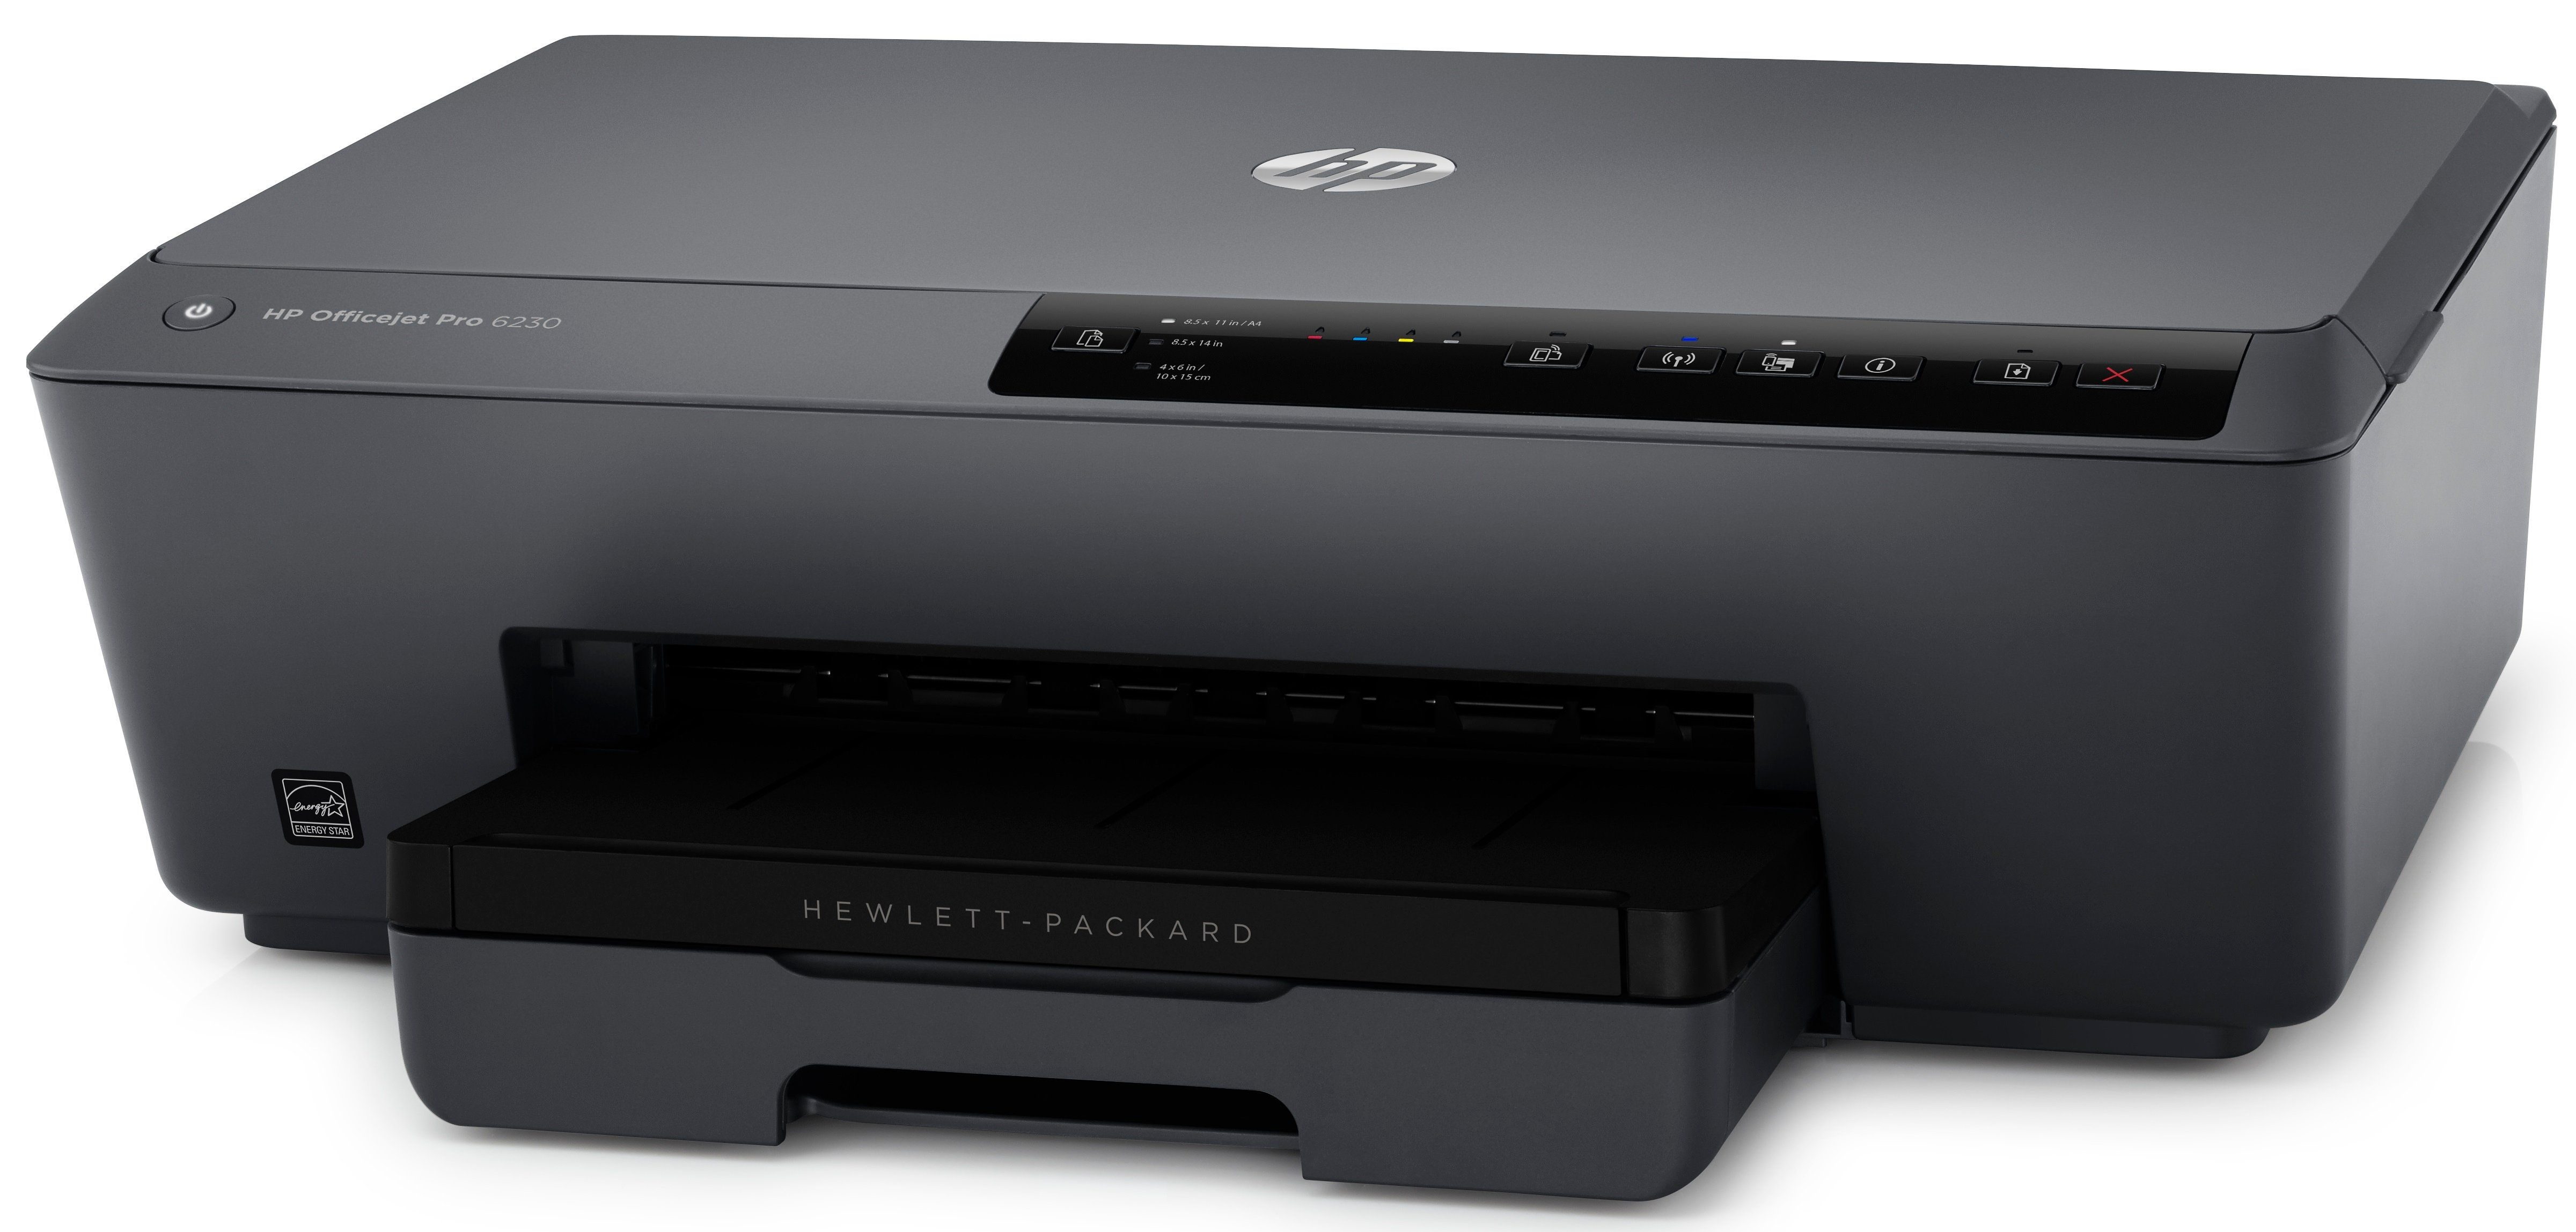 Best printer 2017: The best inkjet printers, laser printers and ...